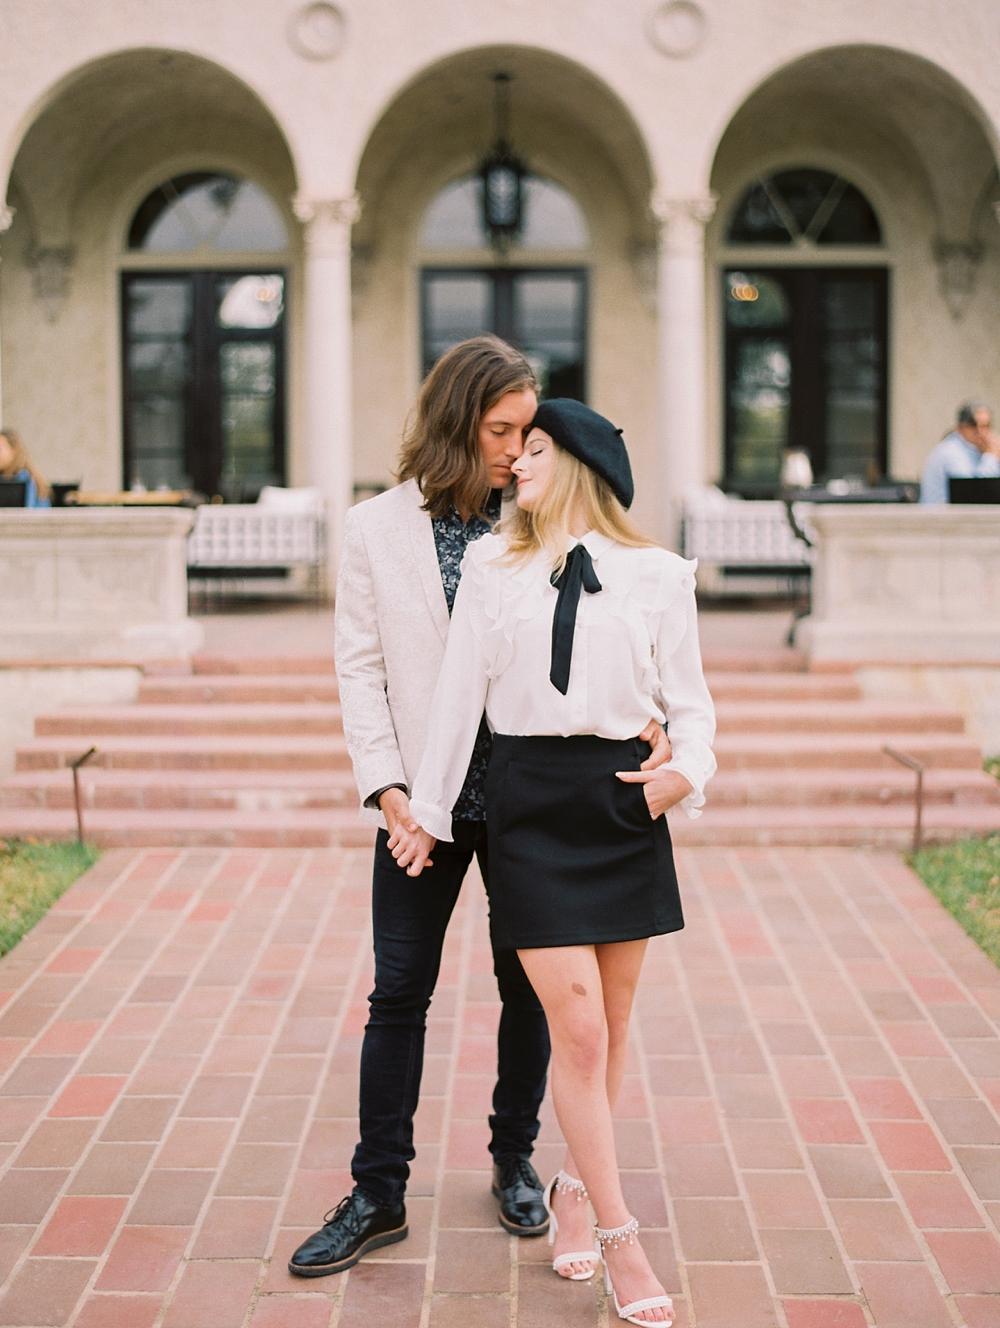 kristin-la-voie-photography-Austin-Wedding-Boudoir-Photographer-Commodore-Perry-Estate-30